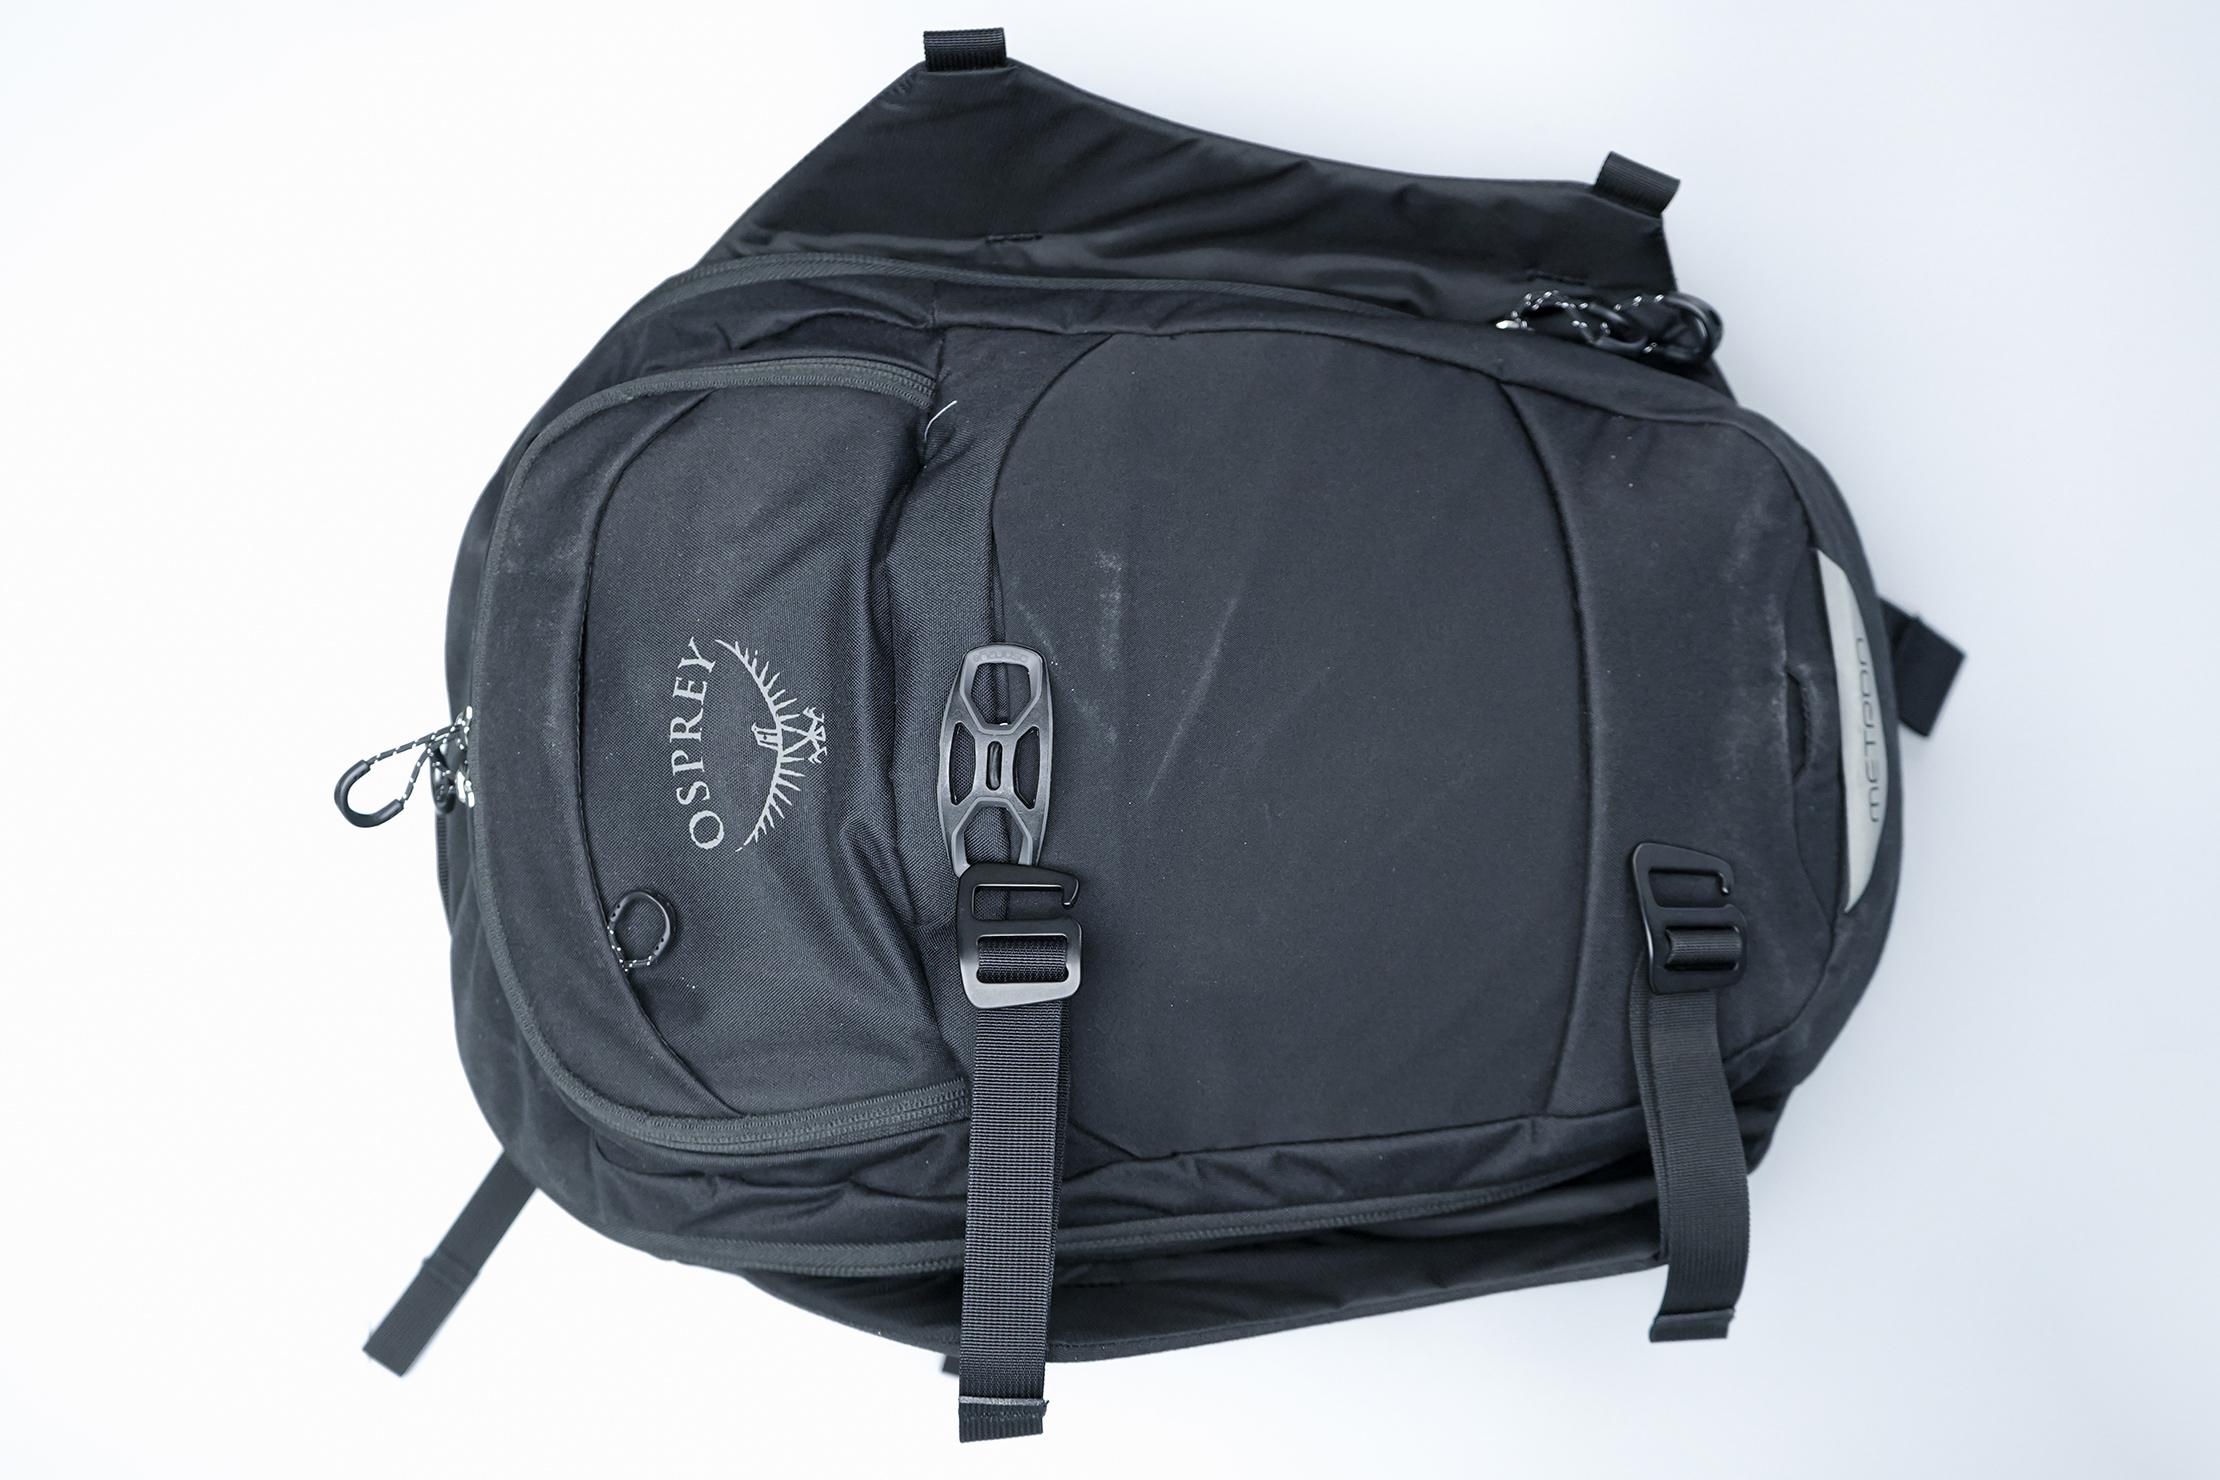 Osprey METRON Straight Jacket Undone